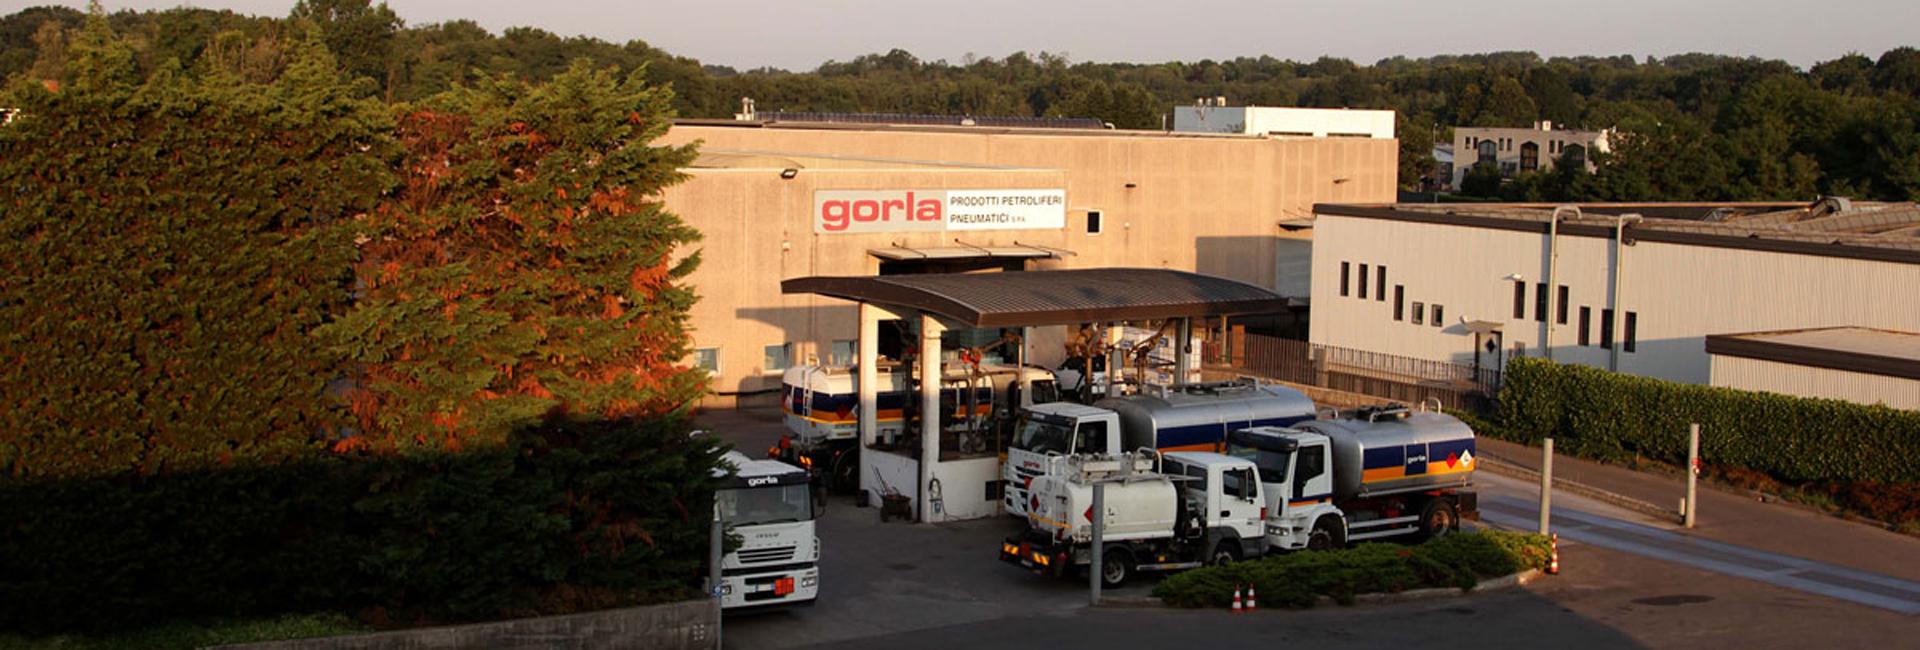 Centro auto Gorla